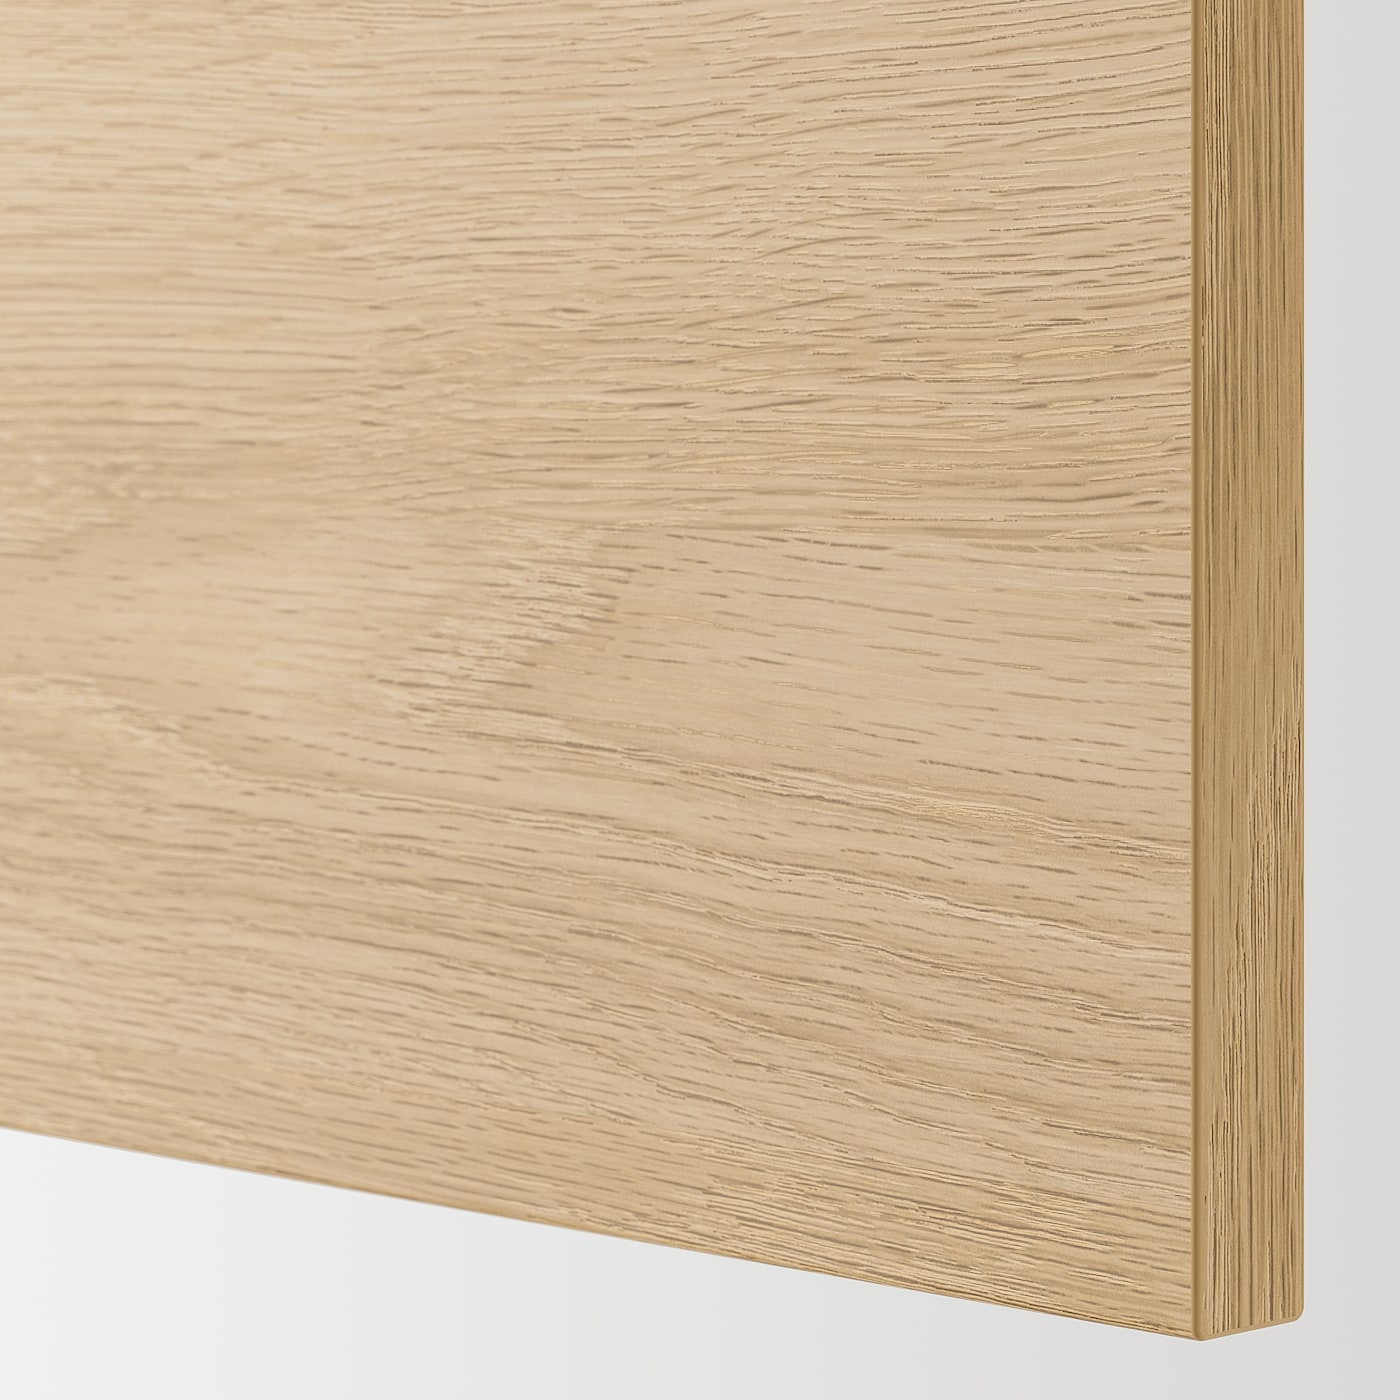 ENHET Zidni element+2 police/vrata, siva/efekt hrasta, 60x15x75 cm